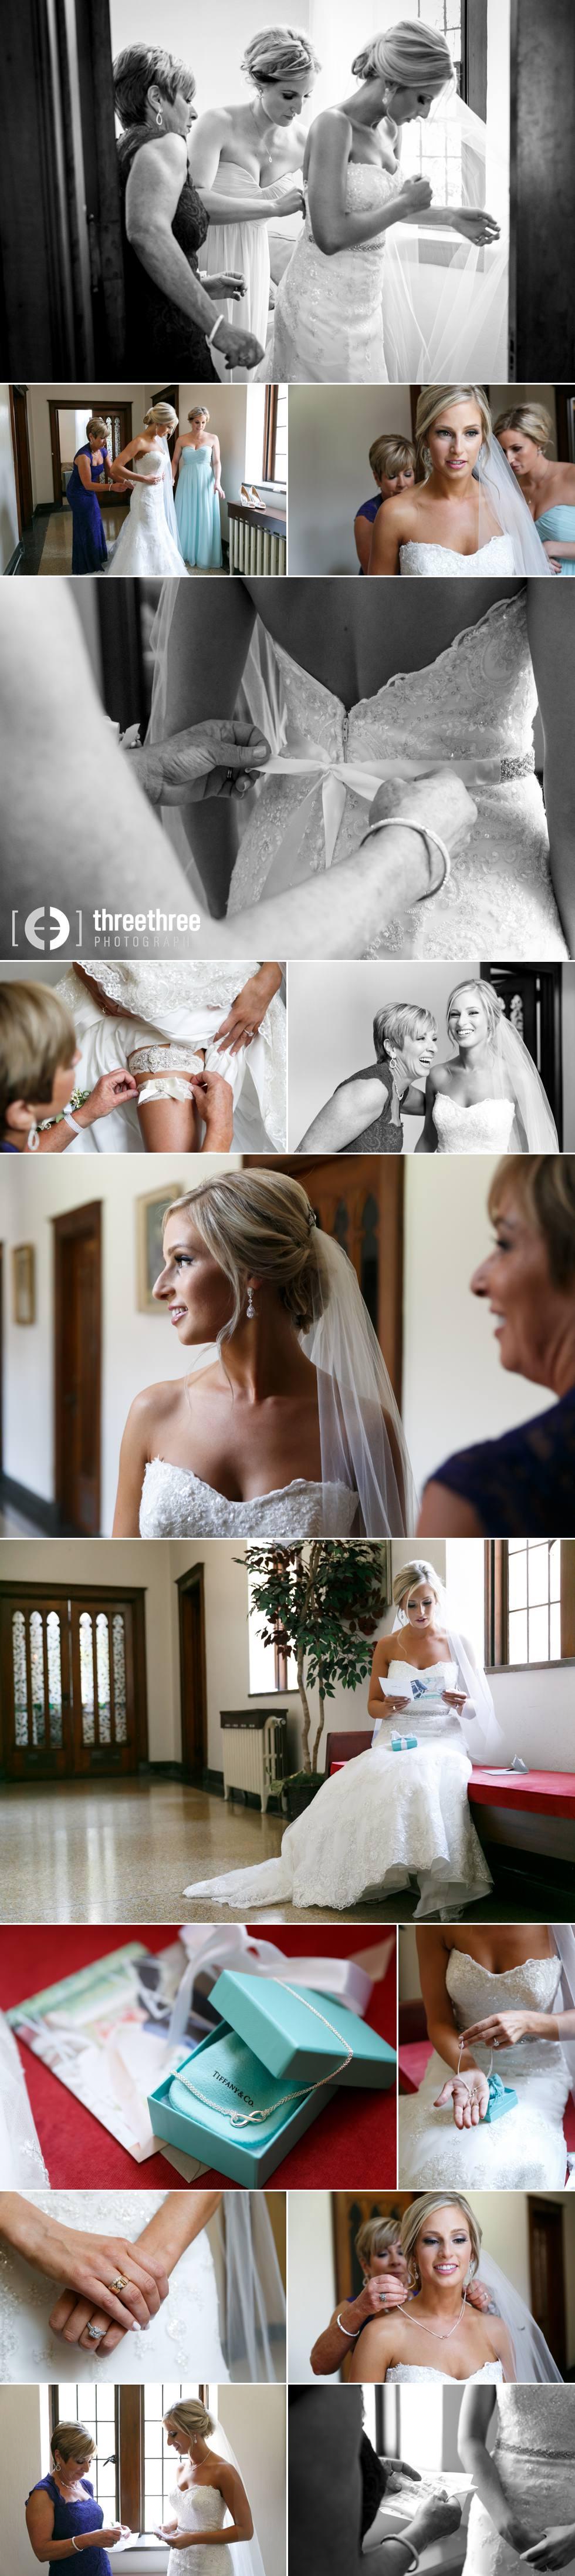 Natalie_AJ_wedding 3